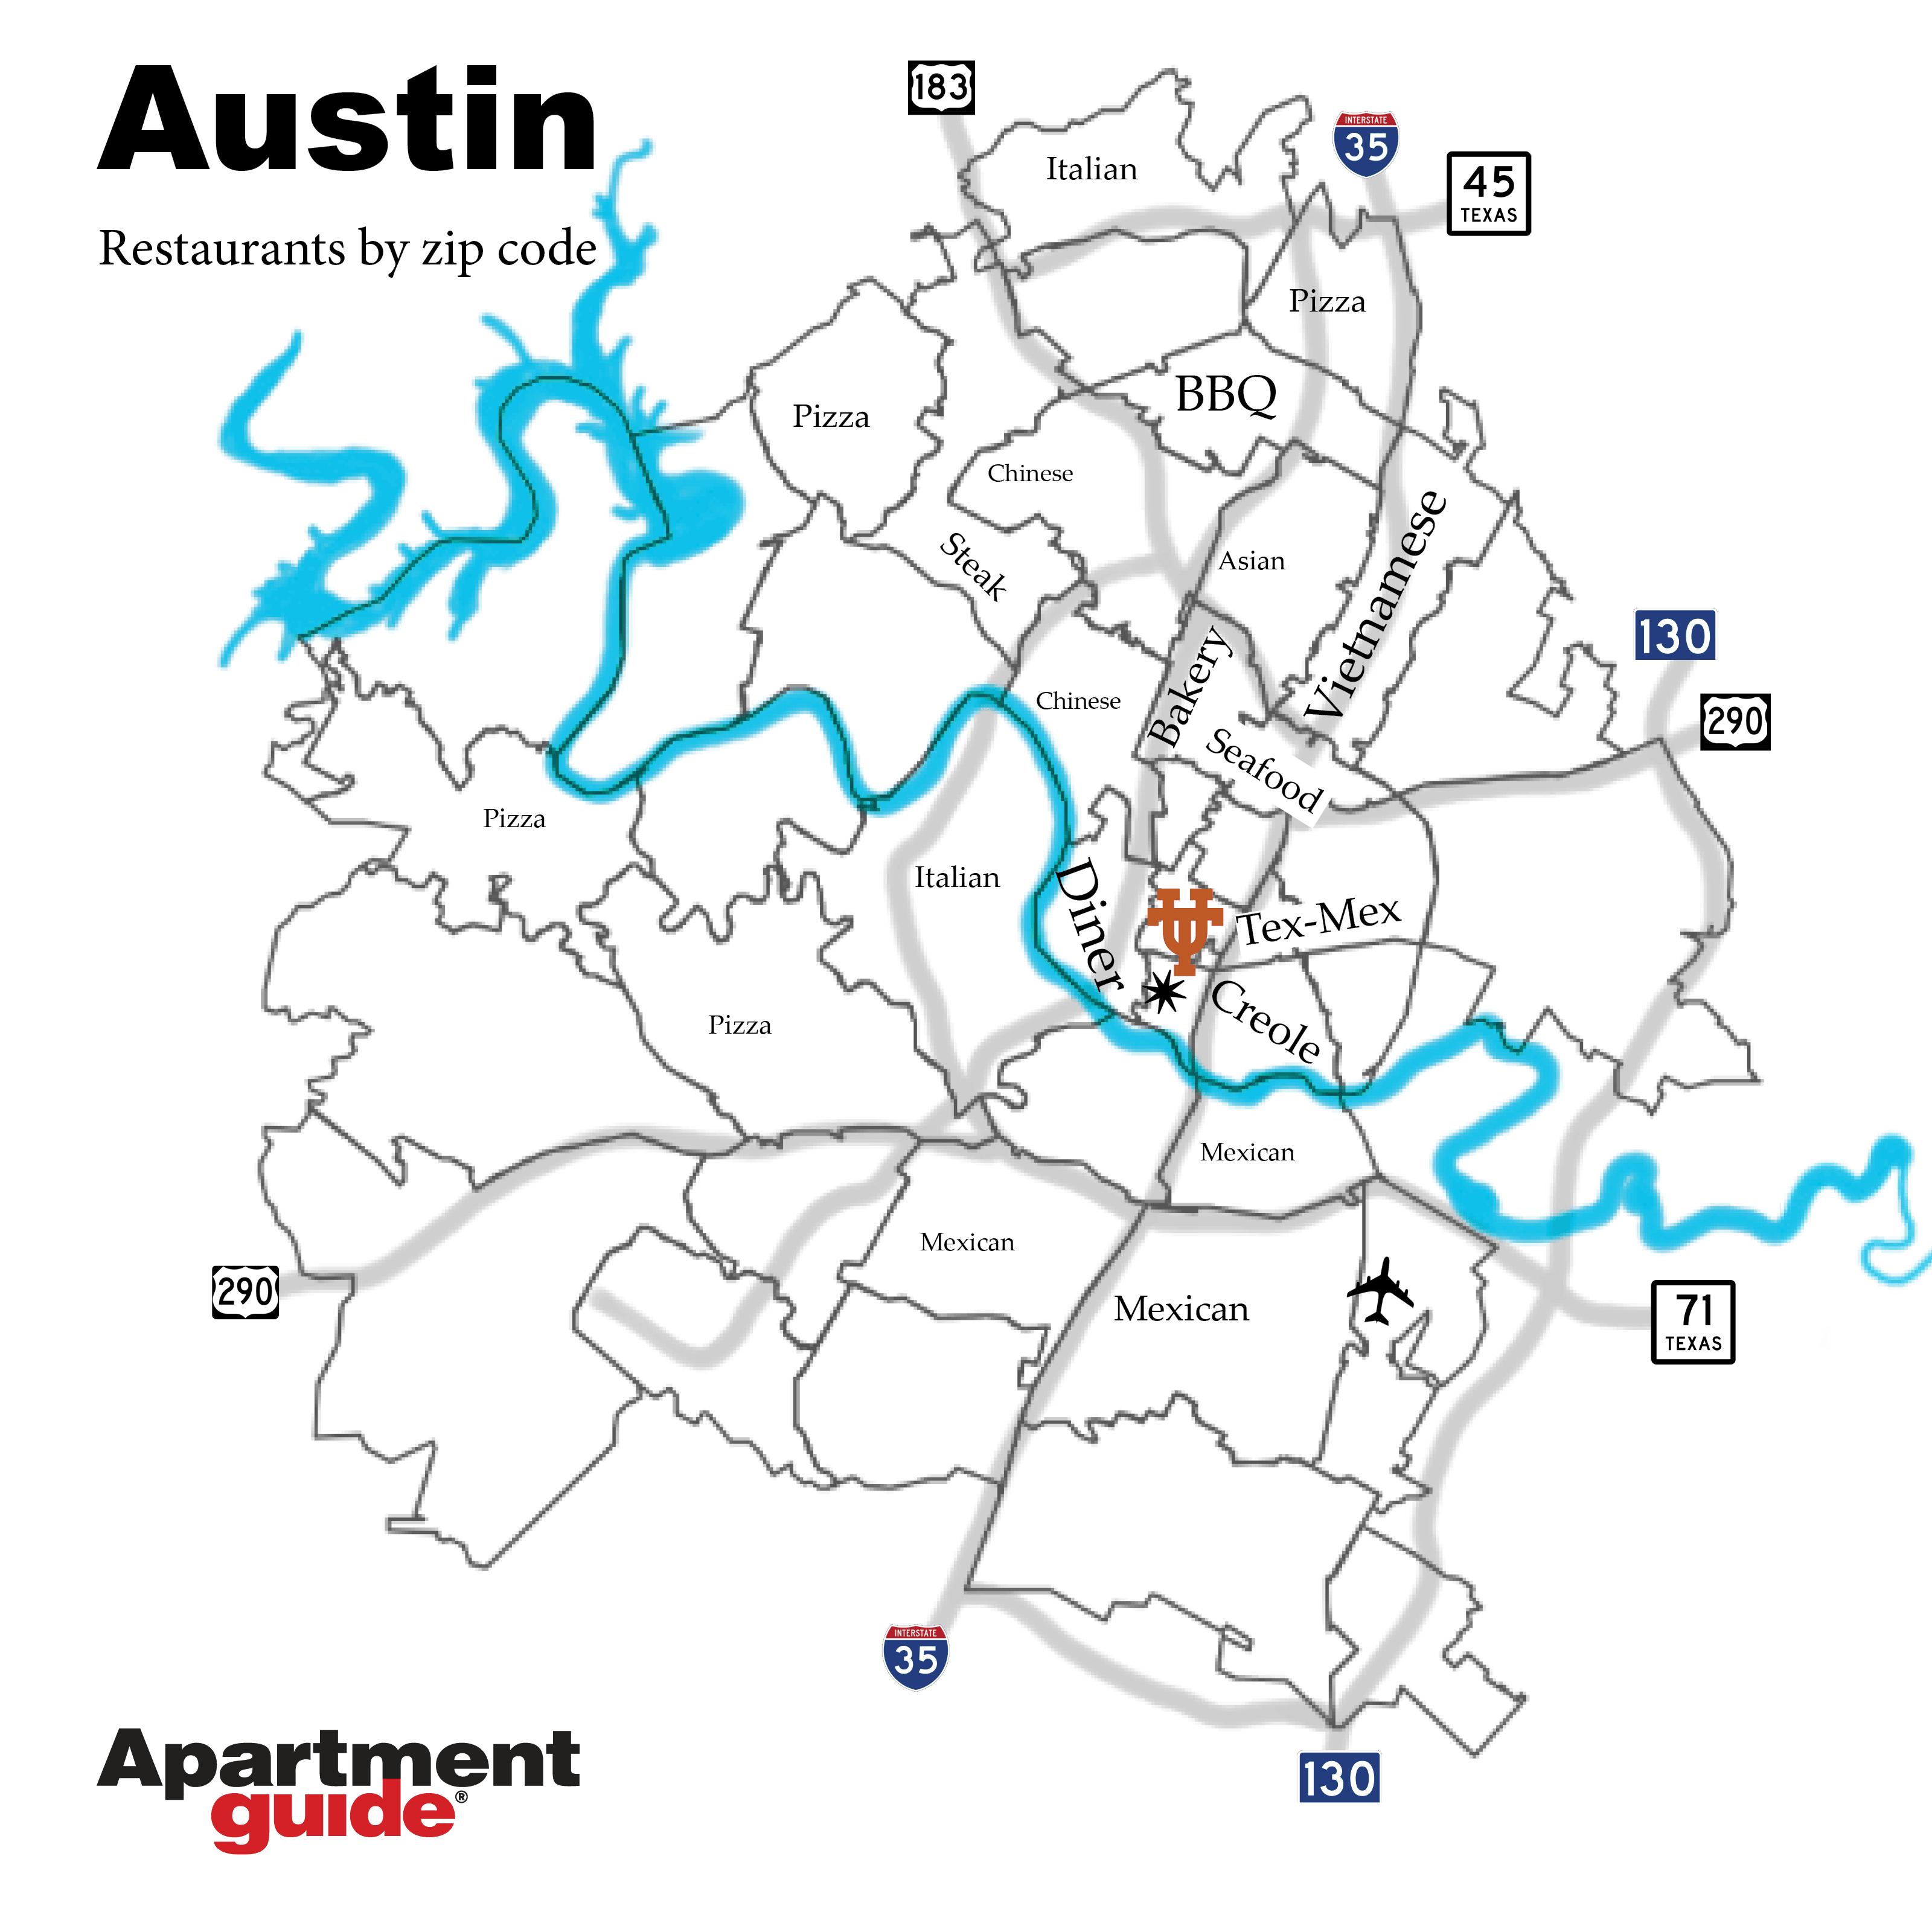 Austin map by most popular restaurant types